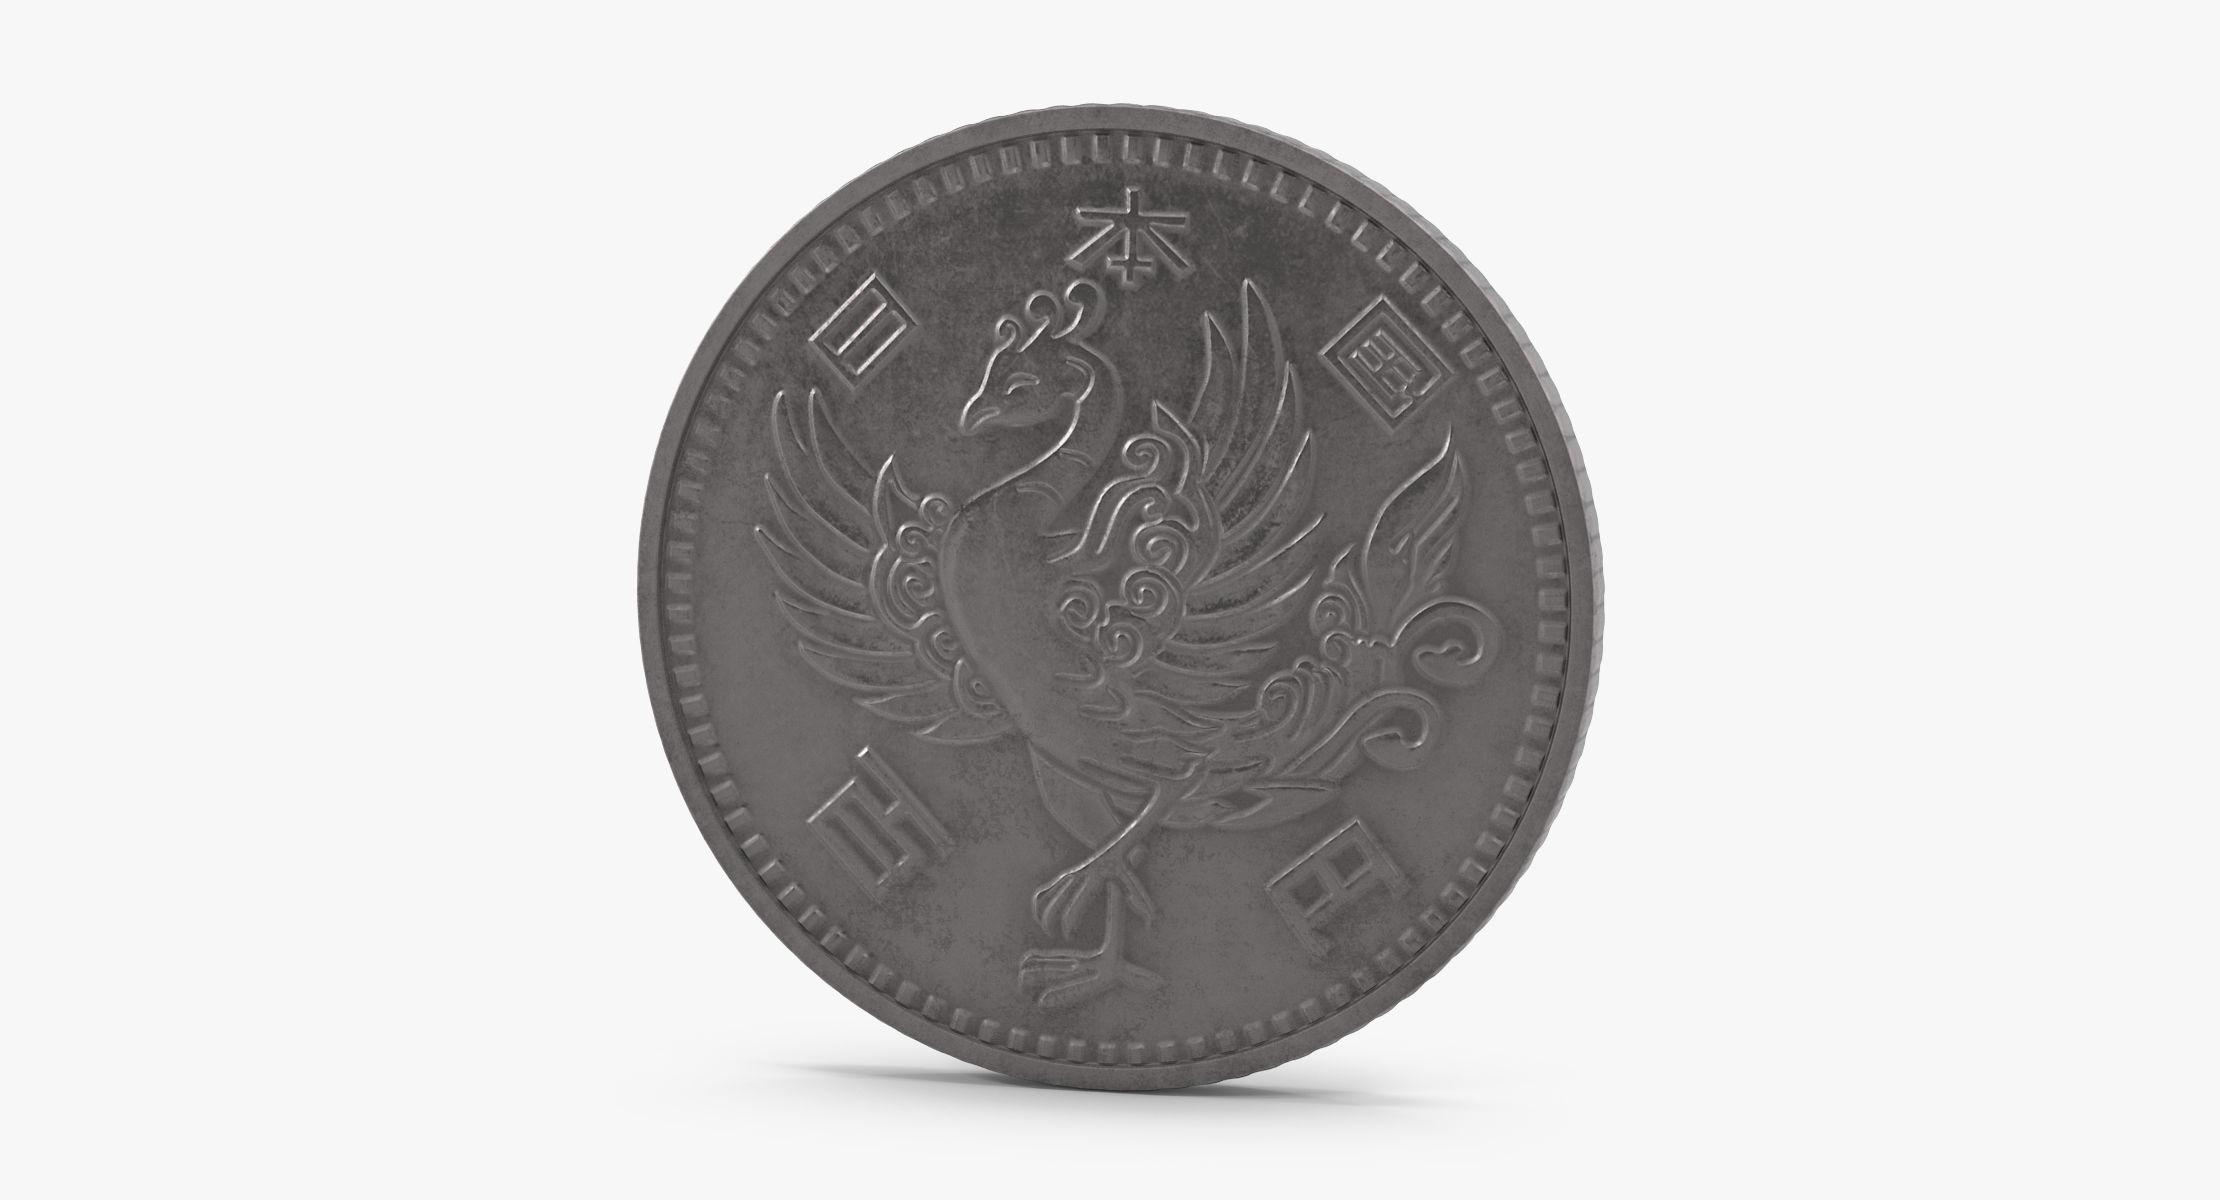 100 Yen Japan - reel 1